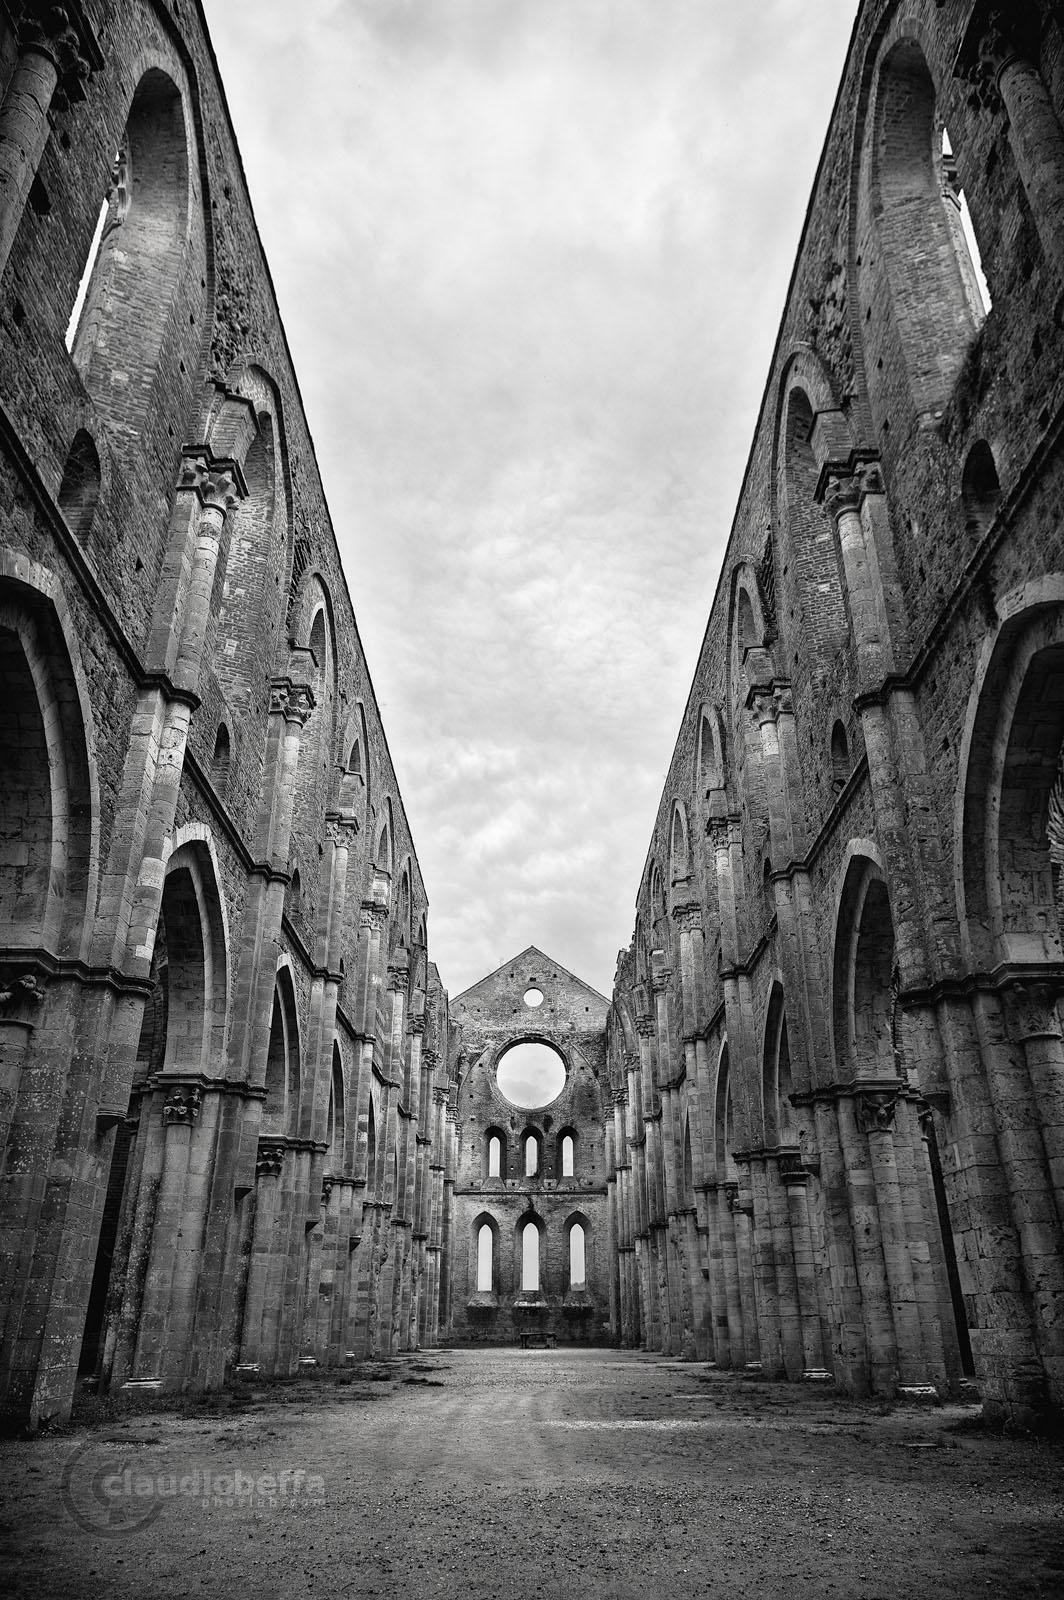 San Galgano, Abbey, Nave, Windows, Layers, Light, Shadows, Capitals, Arches, Ruin, Tuscany, Italy, Nature, History, Architecture, Symmetry